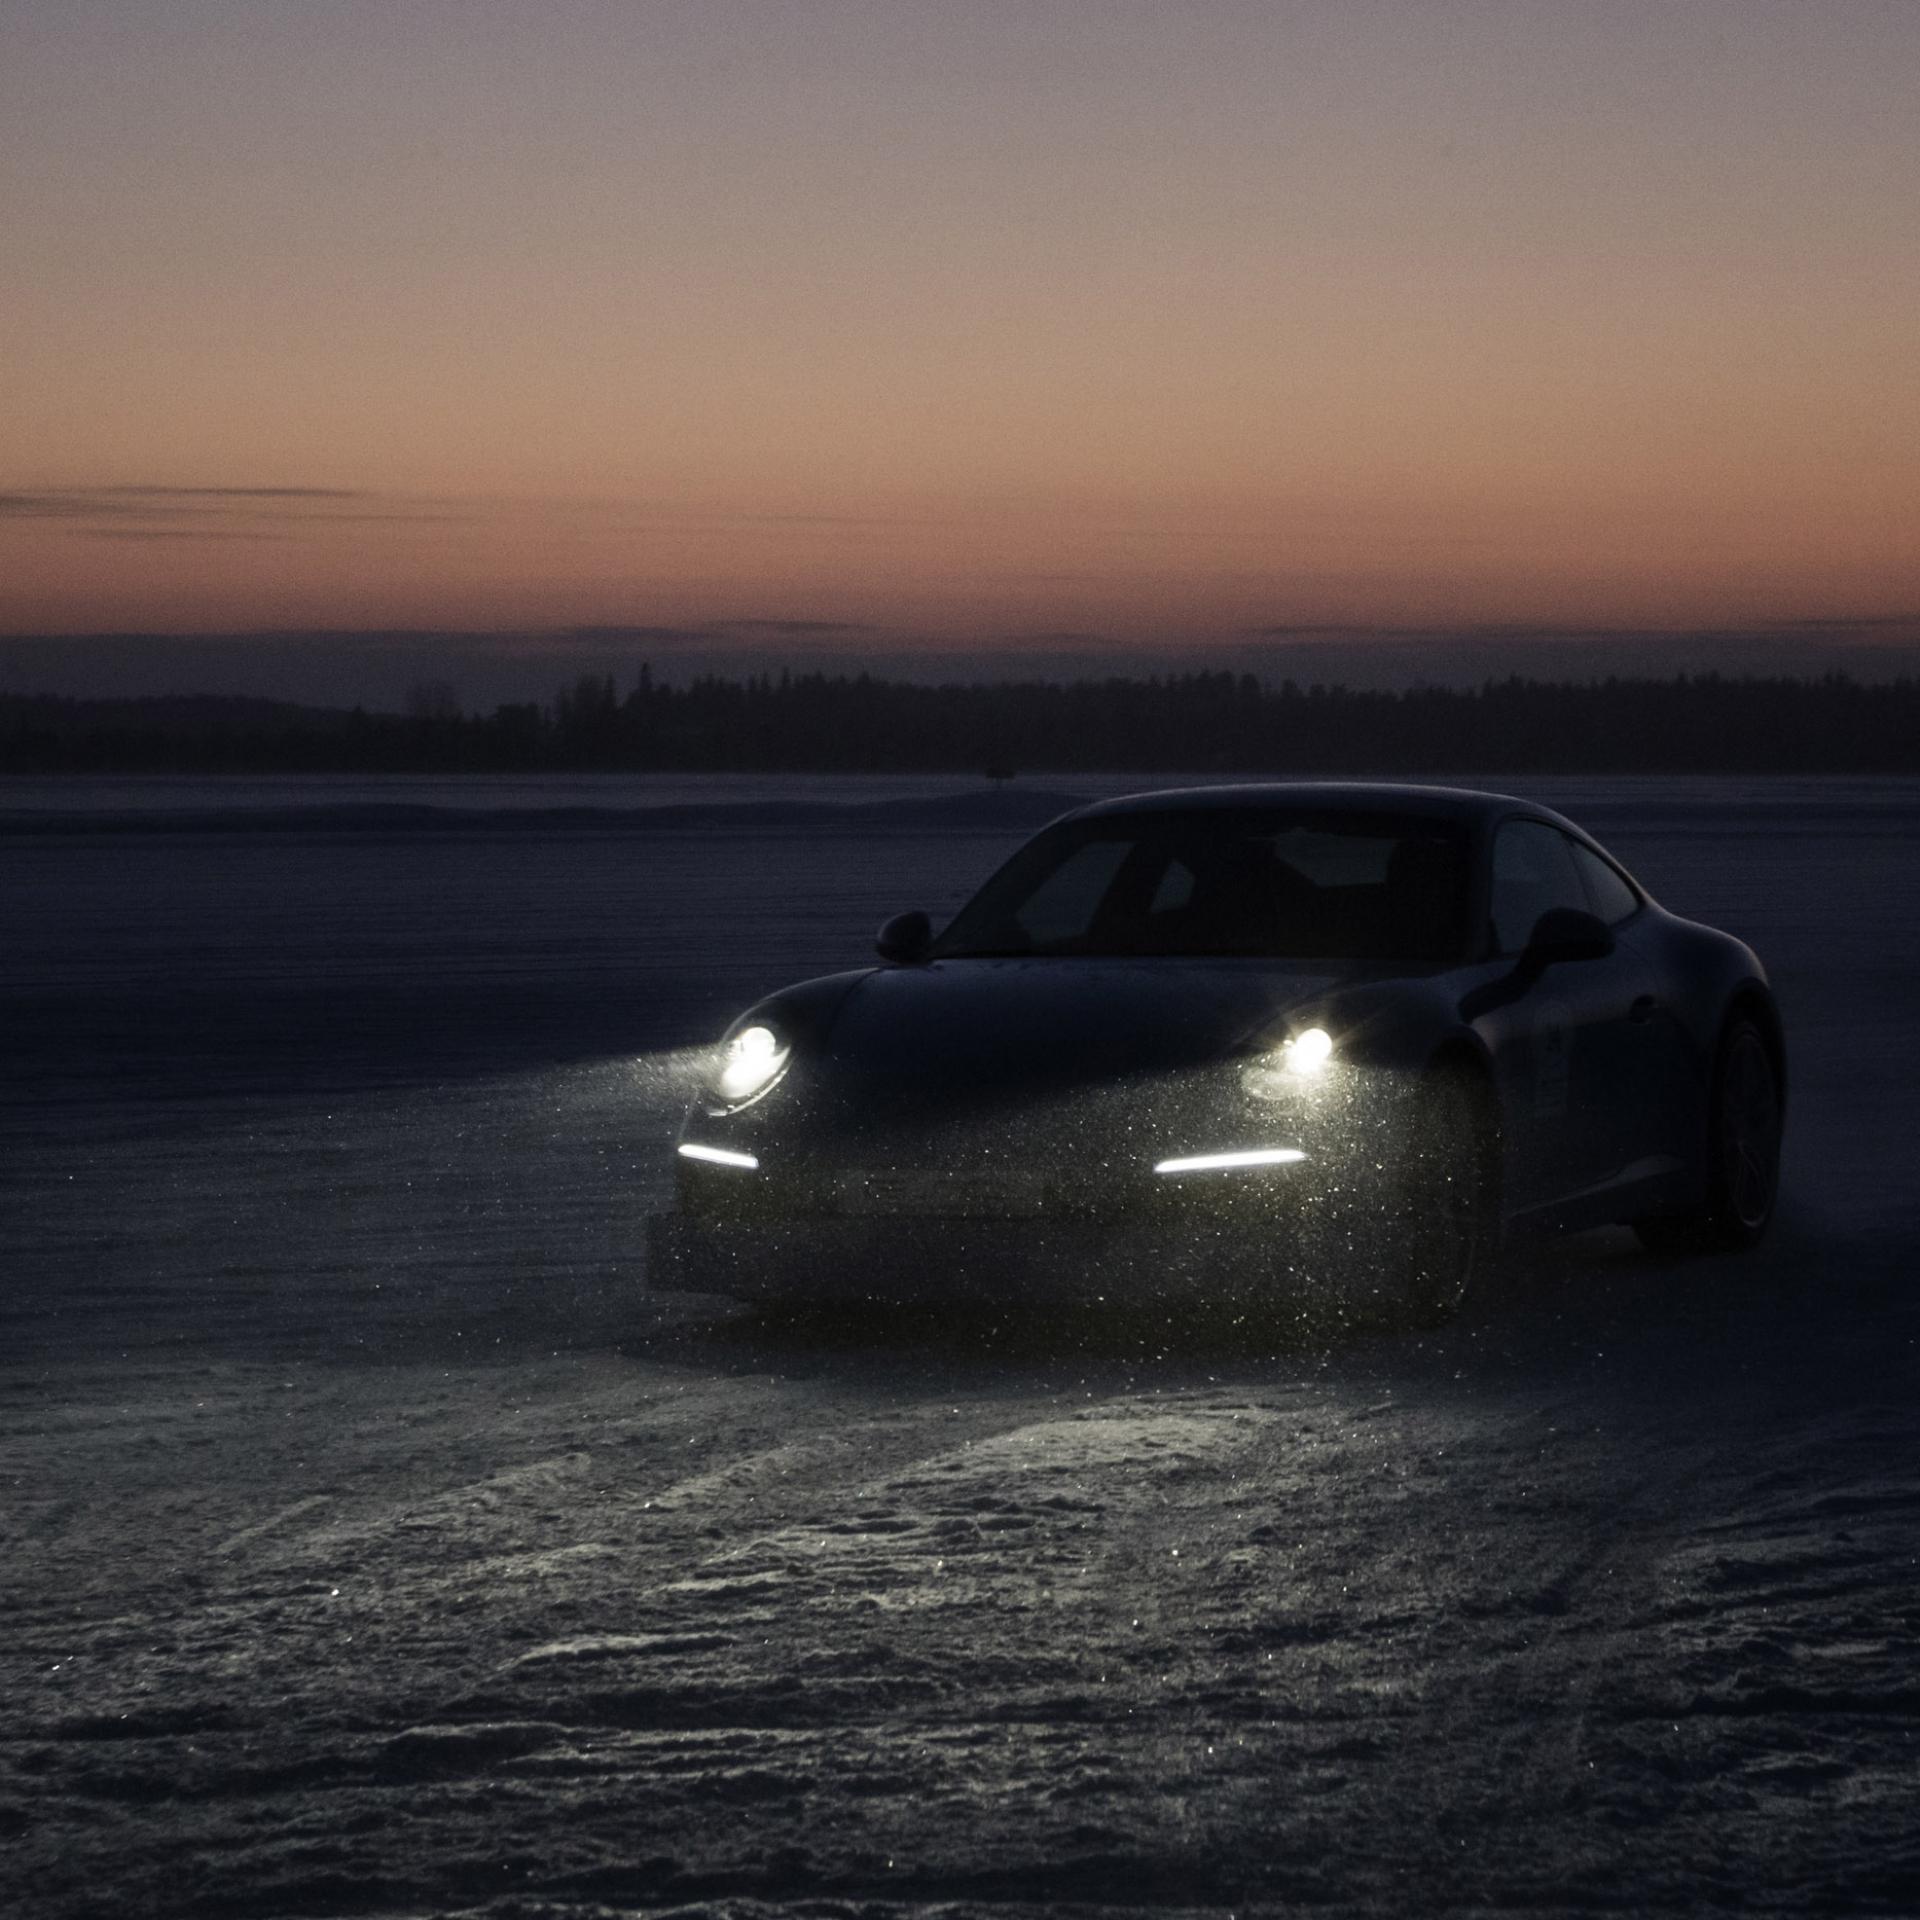 Low Light, Fotografie, Winter, Porsche